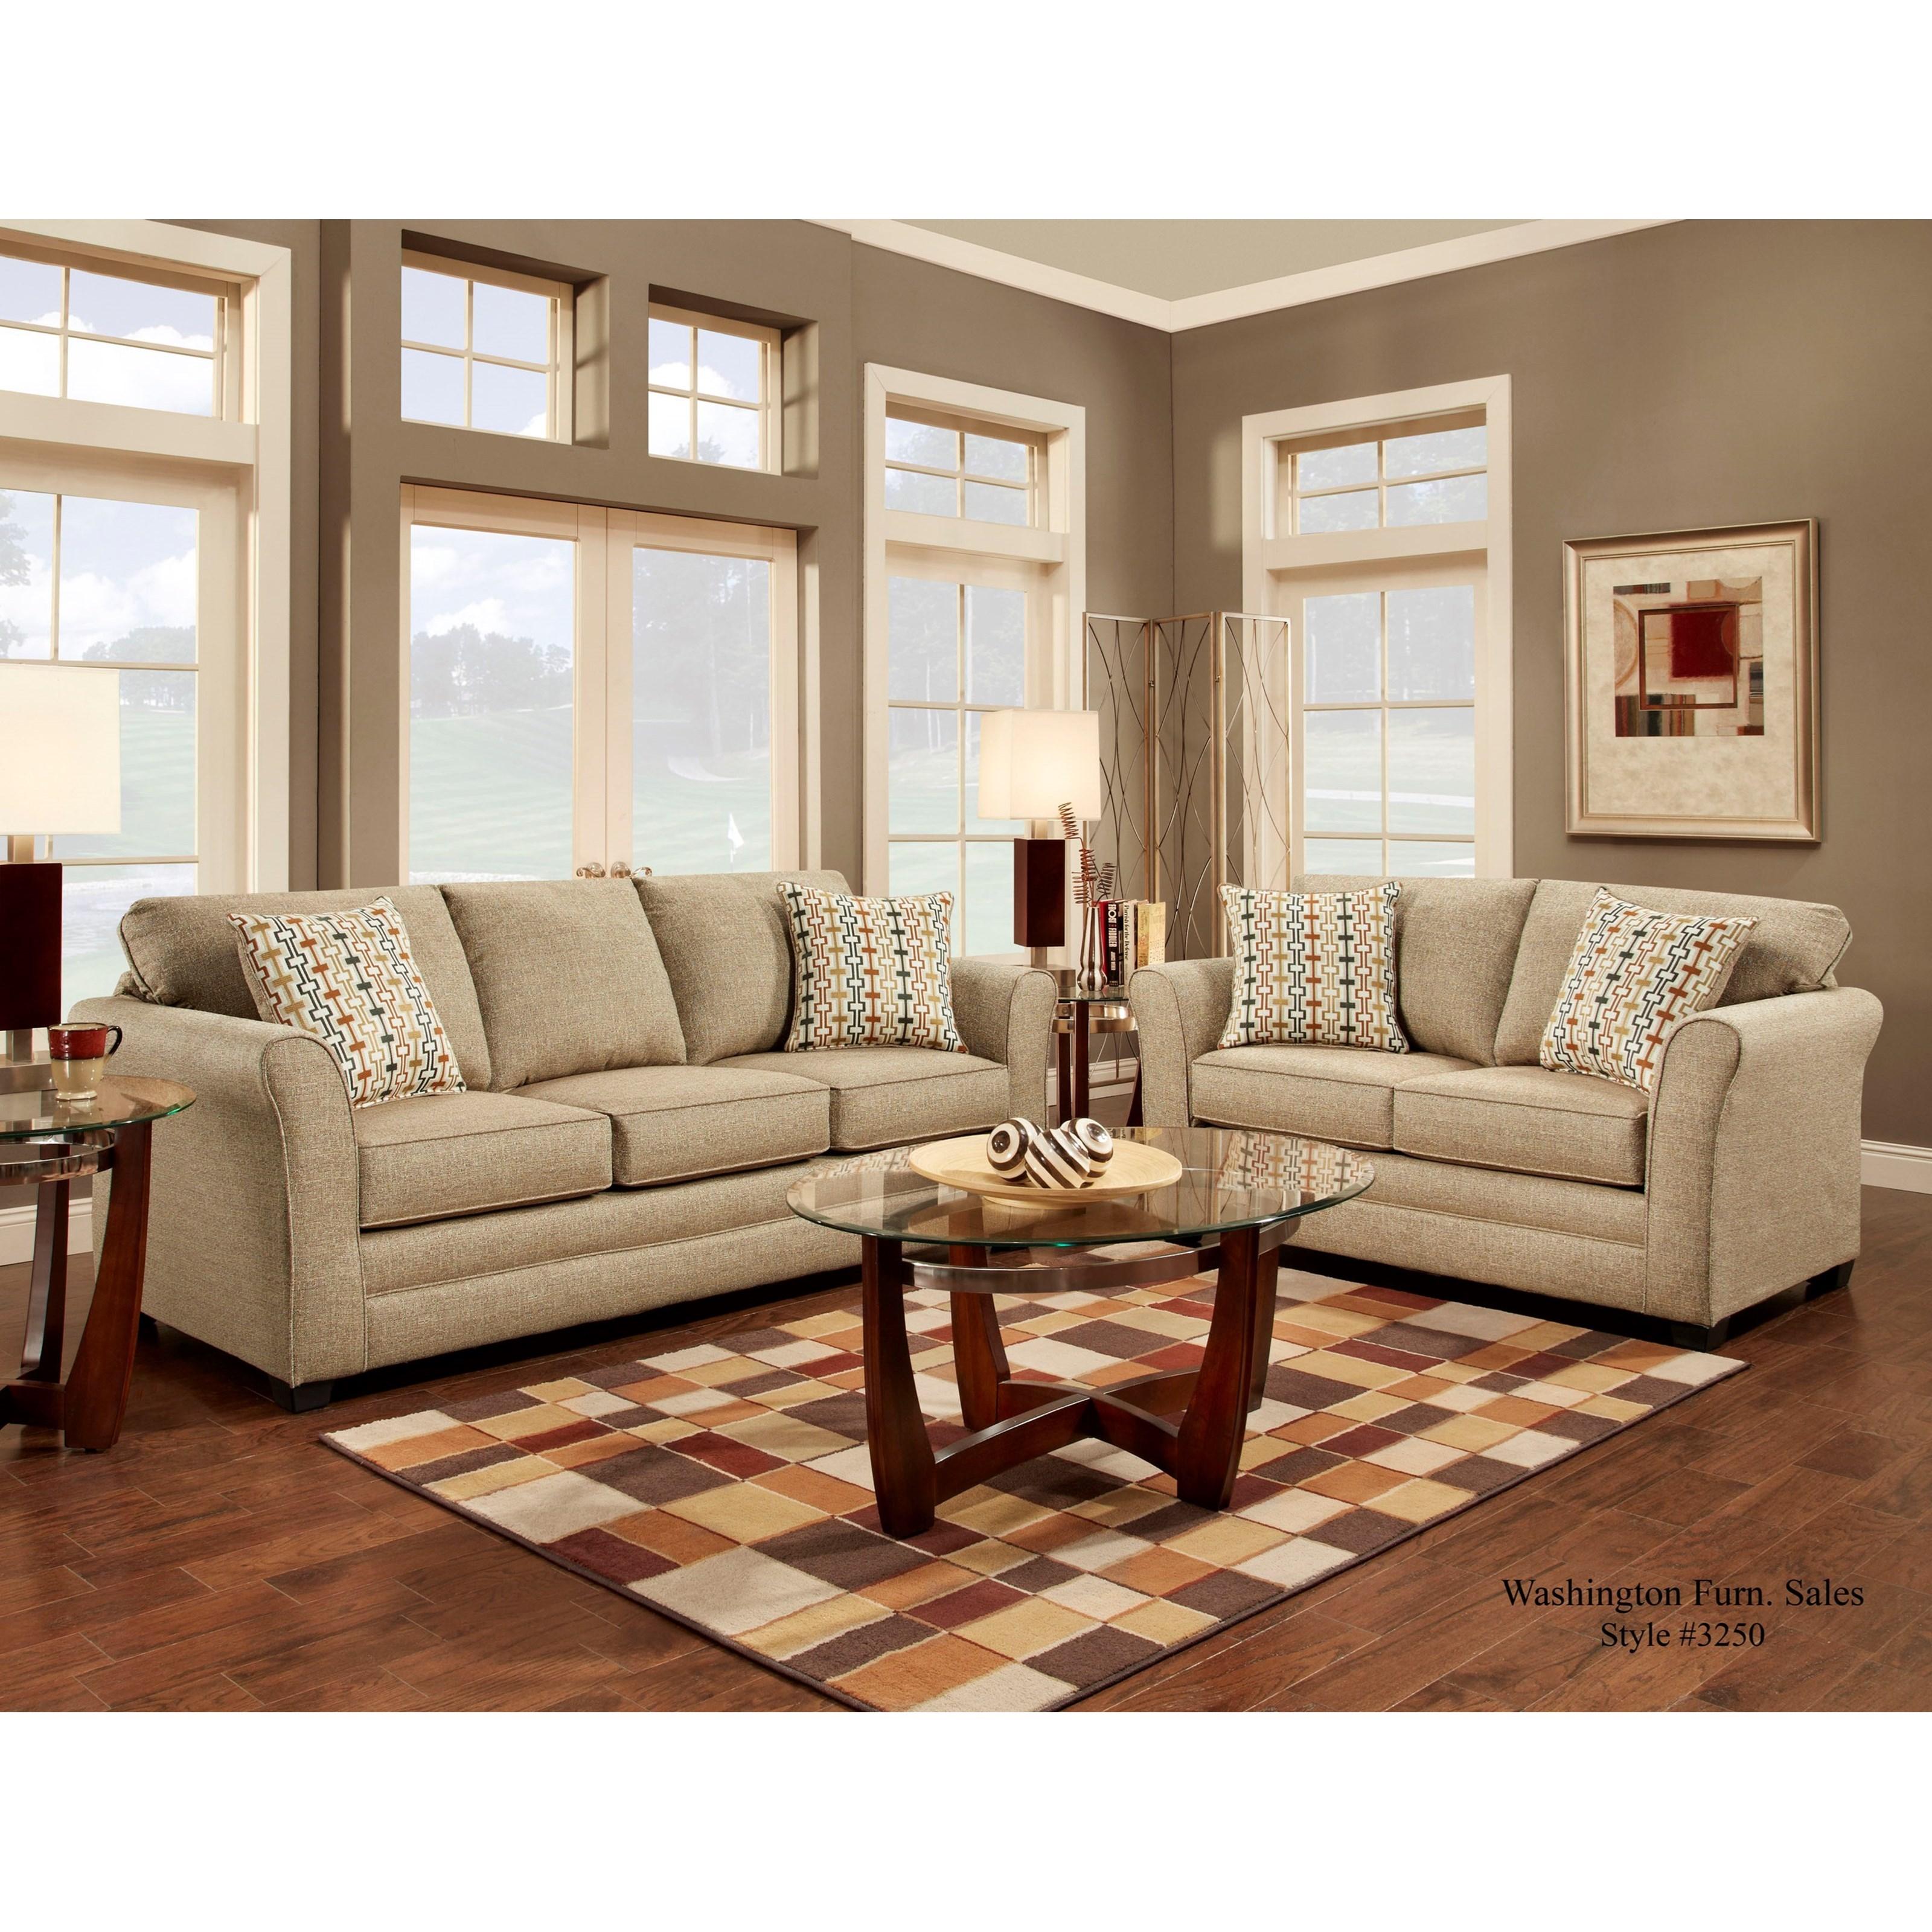 Washington Furniture 3250 Washington Living Room Group Del Sol Furniture Stationary Living